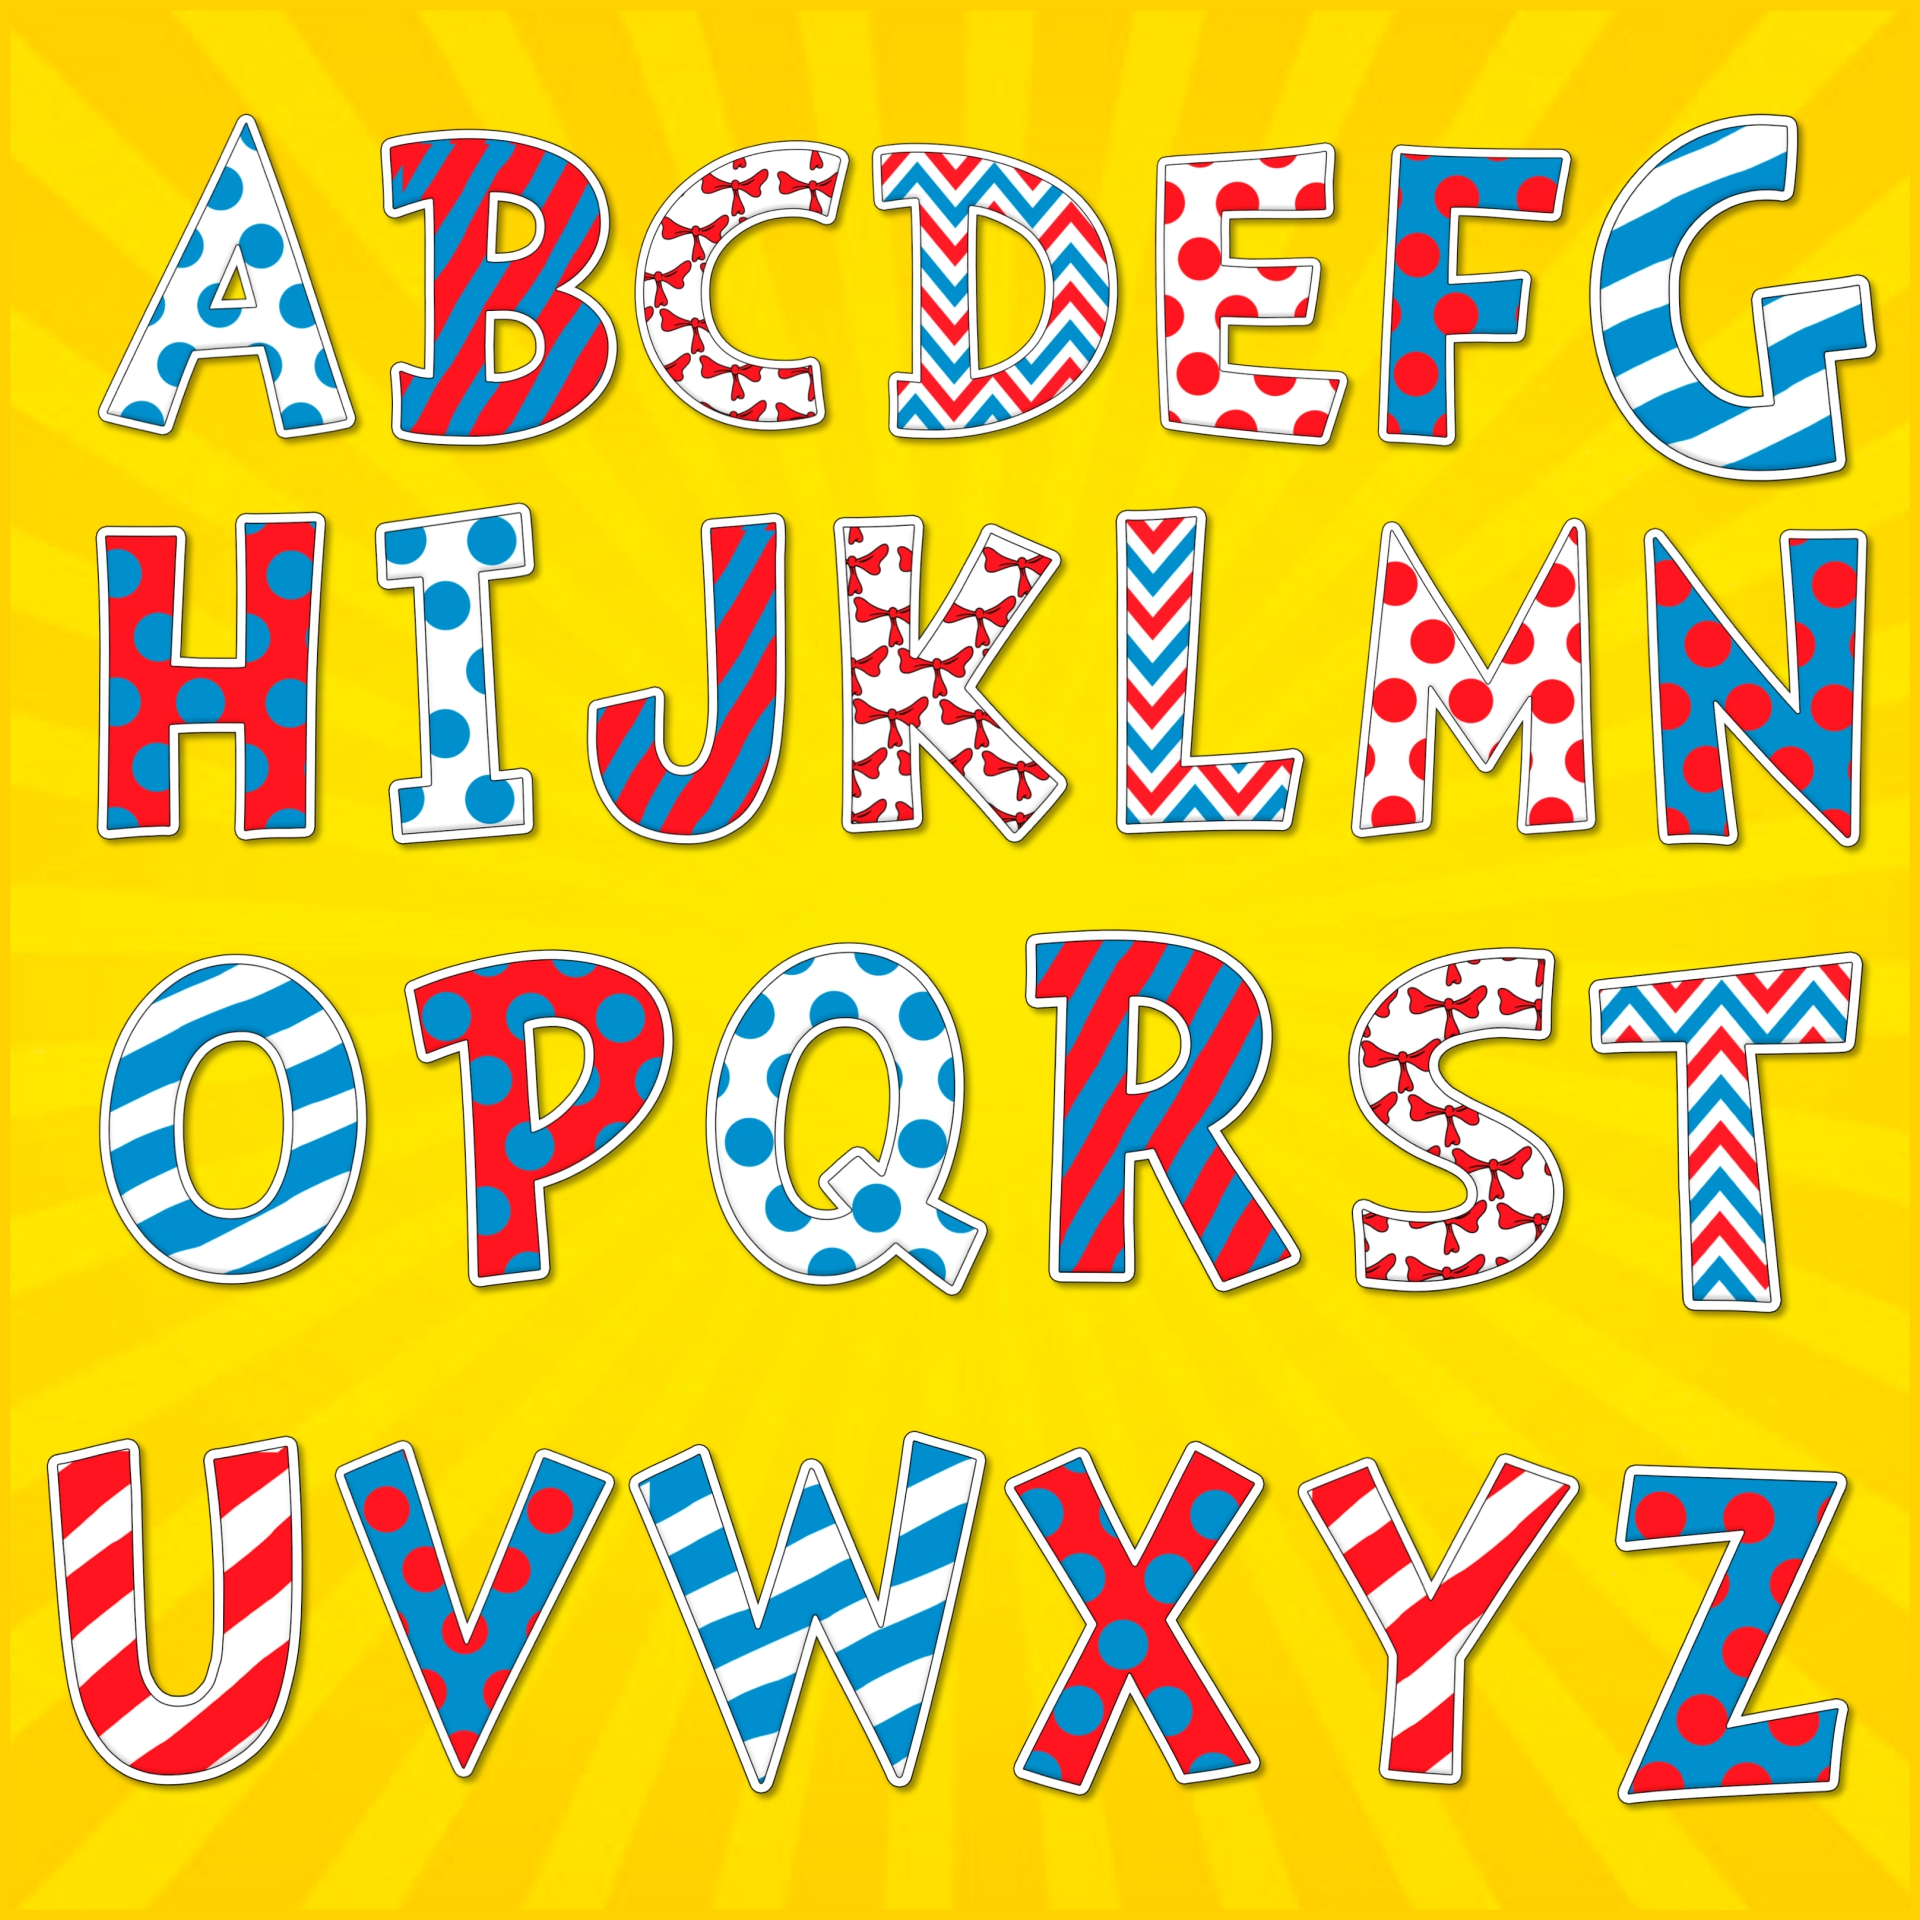 Dr. Seuss Alphabet Letters for Bulletin Boards